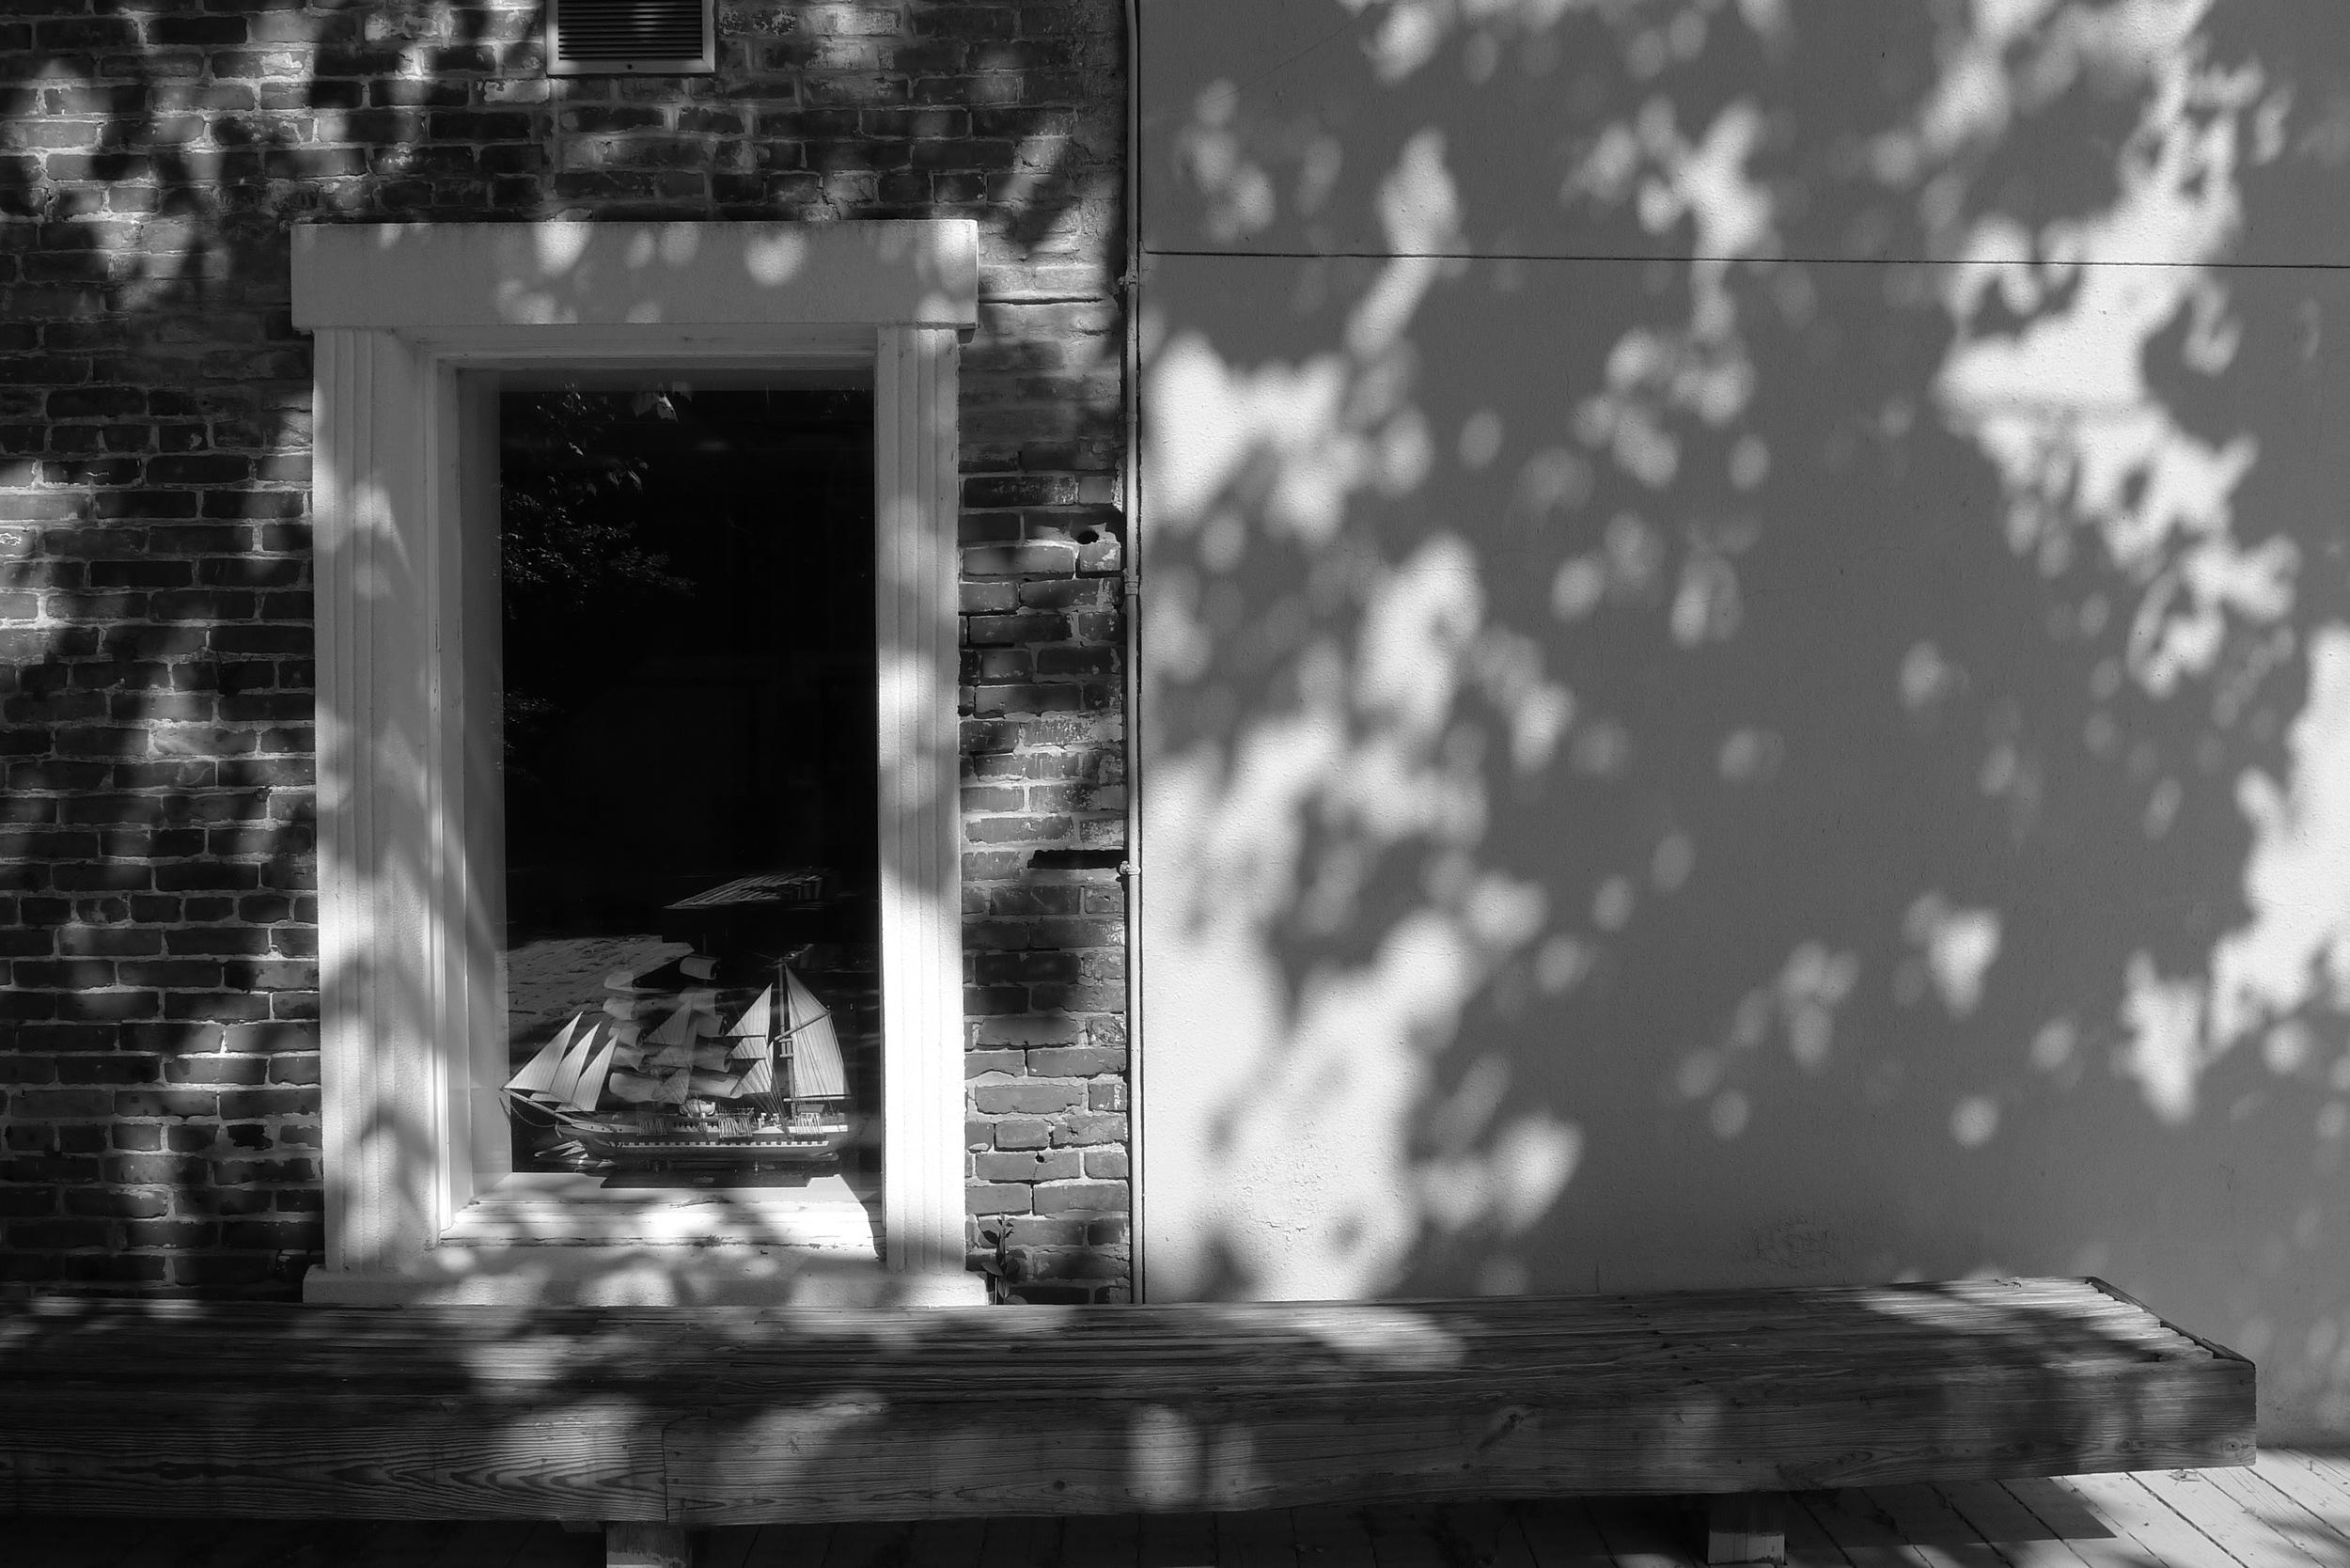 Boat Window, Augusta, GA 2015